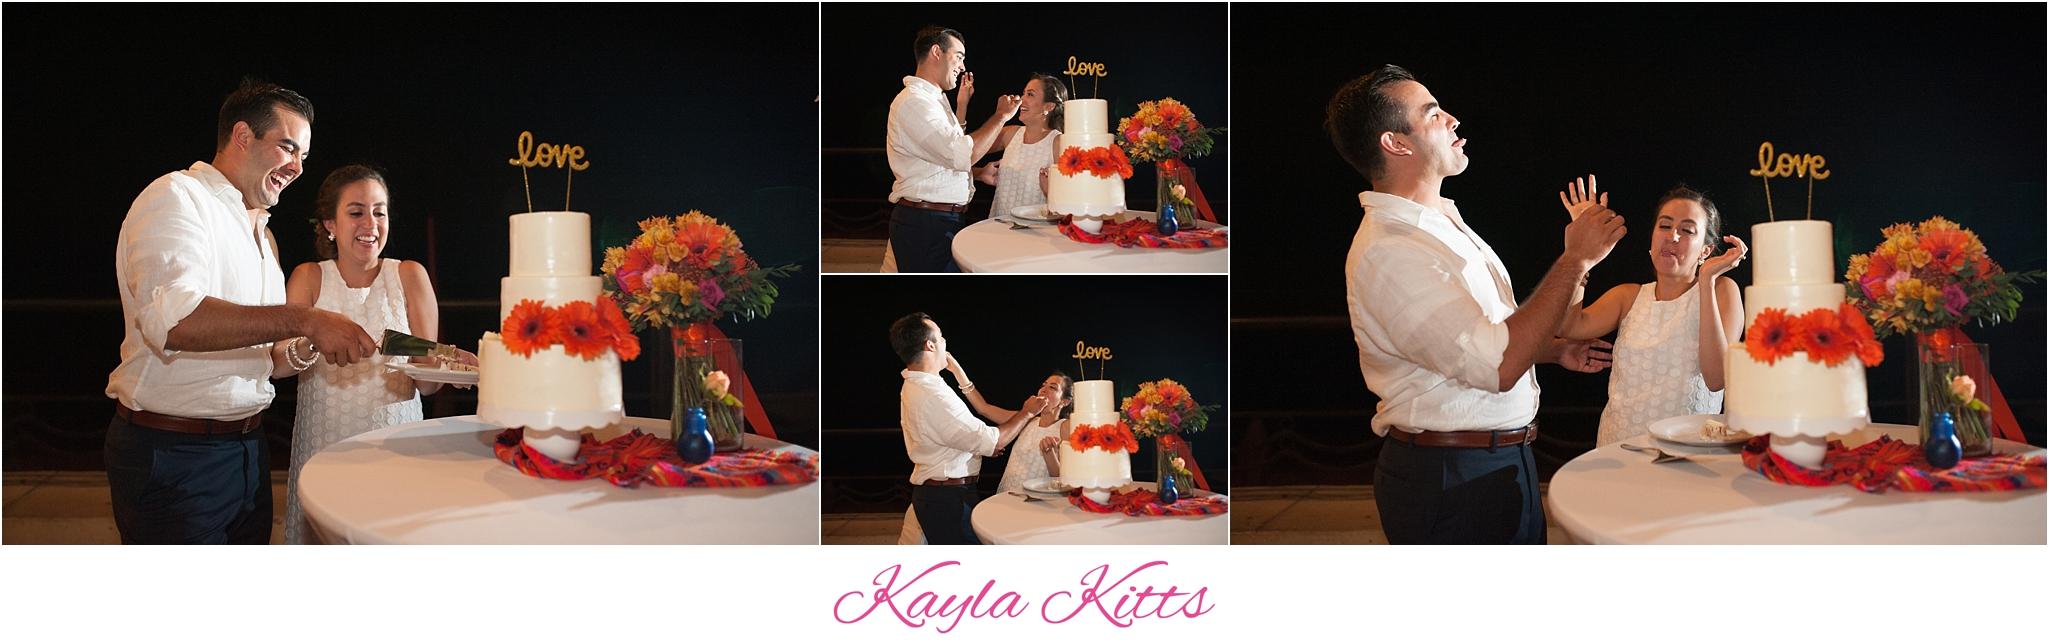 kayla kitts photography-travis and sarah-cabo wedding-cabo wedding photographer-destination wedding photographer-paris wedding photographer-albuquerque wedding-matt jones-albuquerque wedding vendor-intimate wedding_0037.jpg